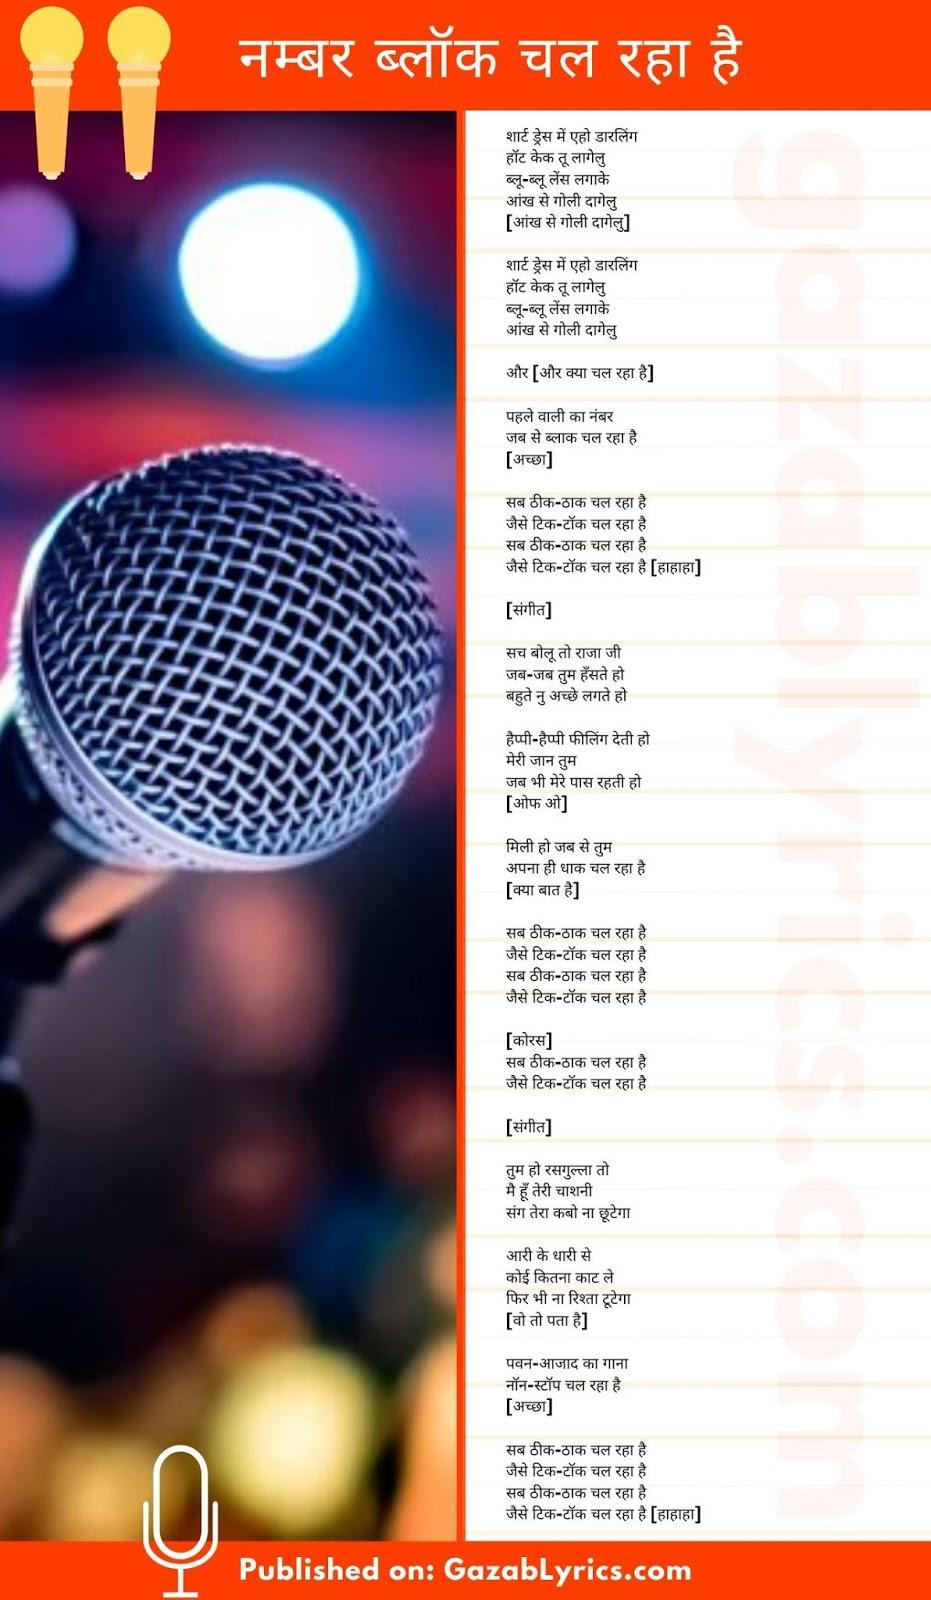 Number Block Chal Raha Hai song lyrics image